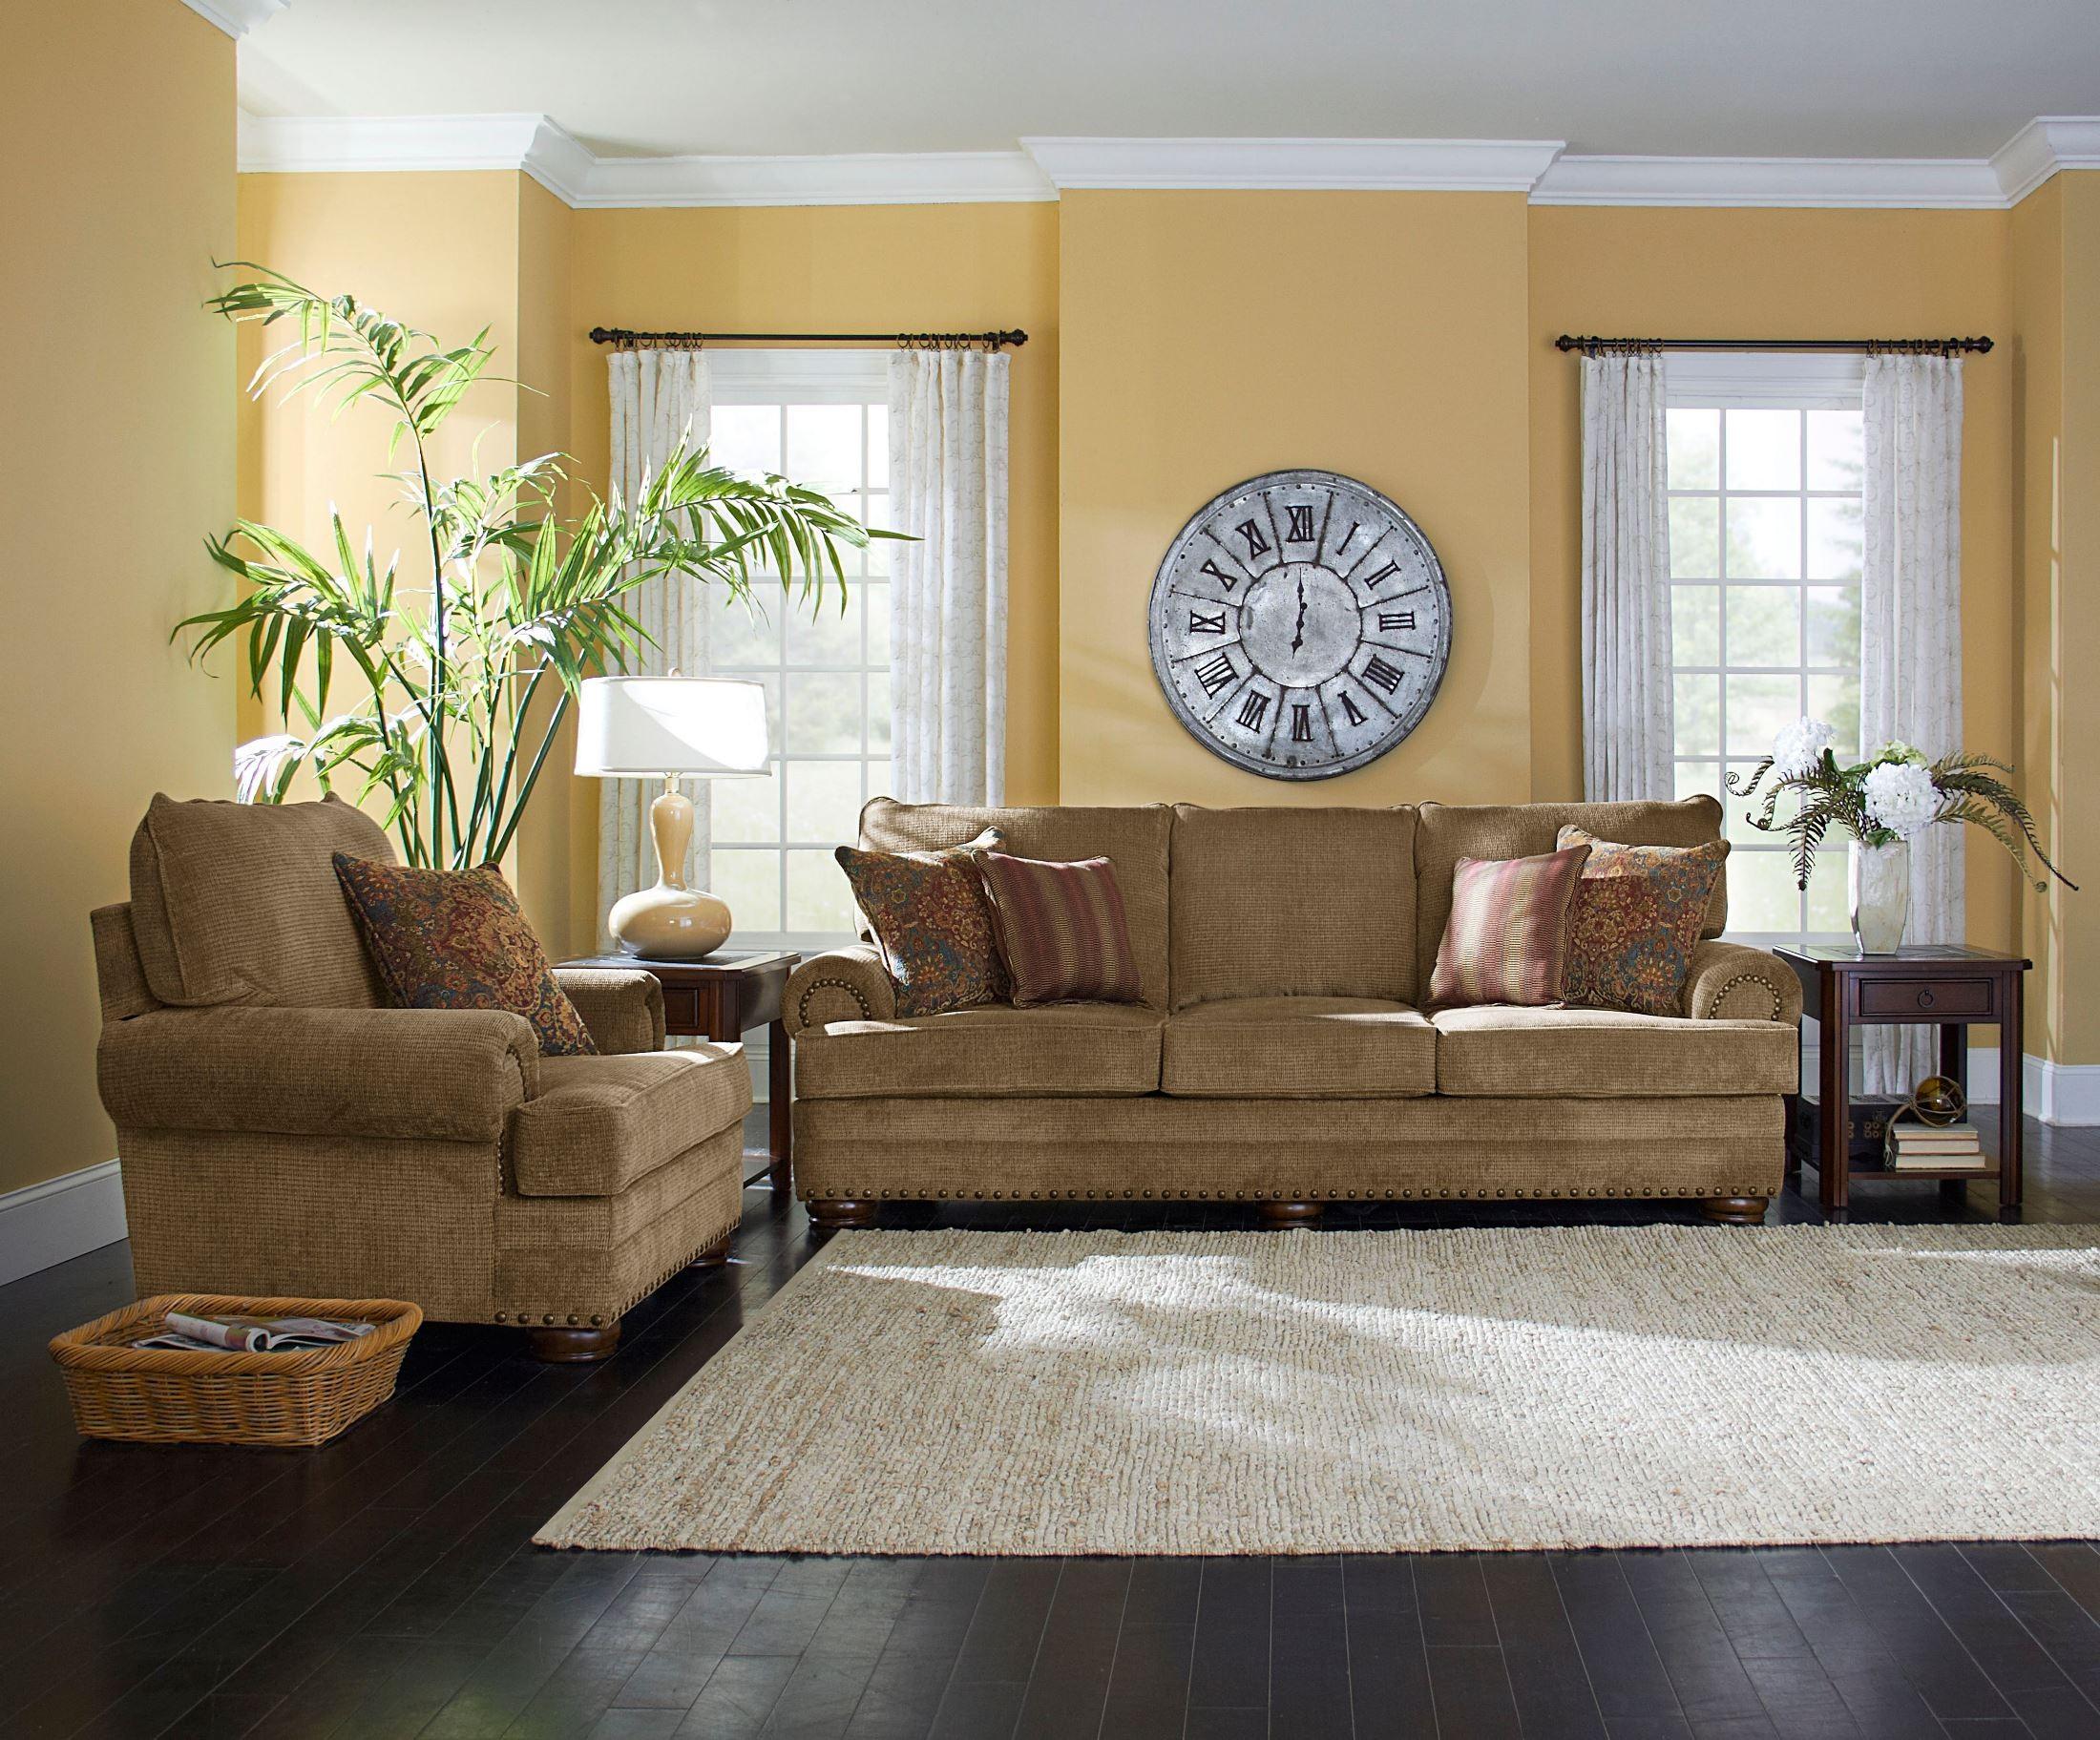 cooper sofa by lane microfiber queen sleeper living room set from 732 30 69 coleman